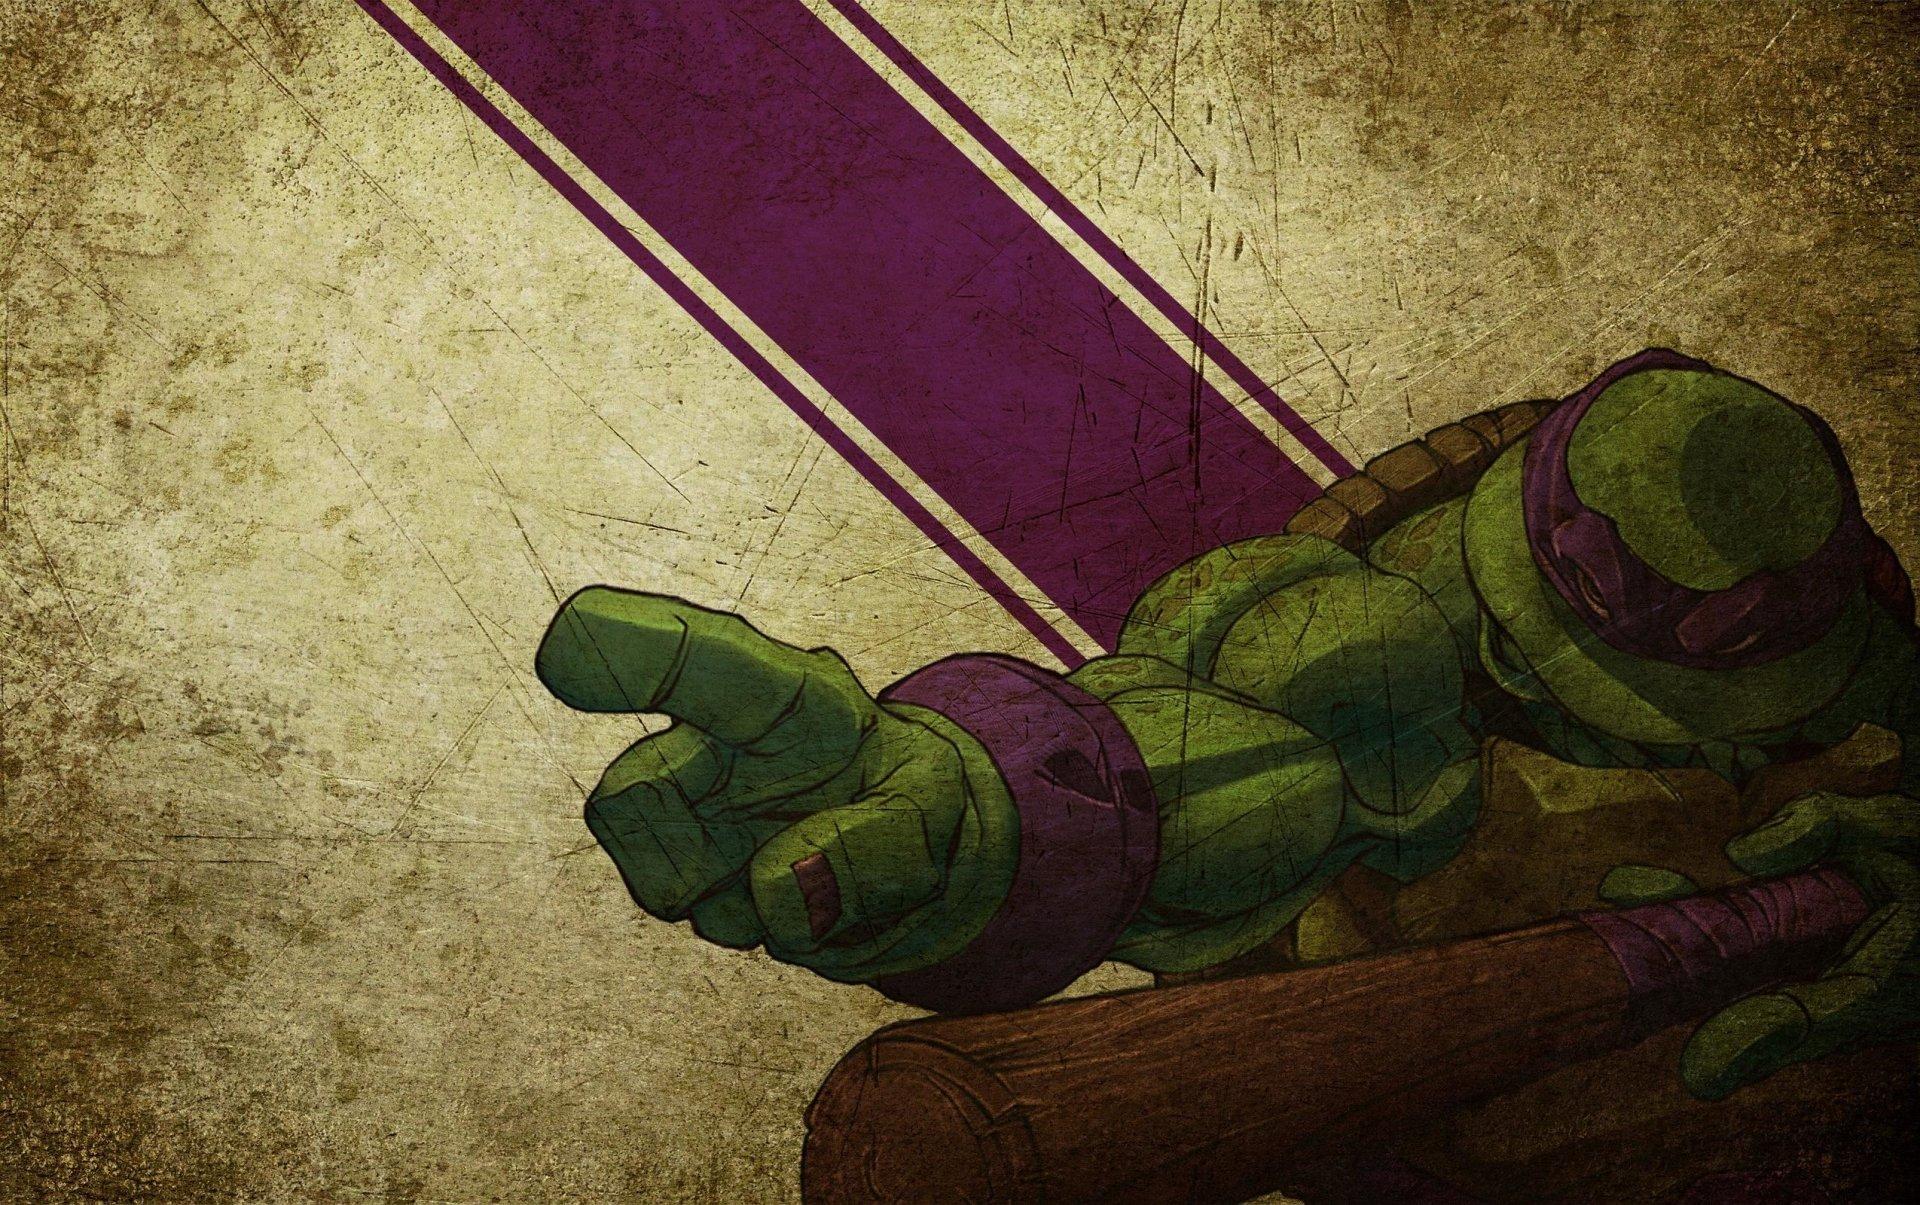 Comics - TMNT  Donatello (TMNT) Wallpaper